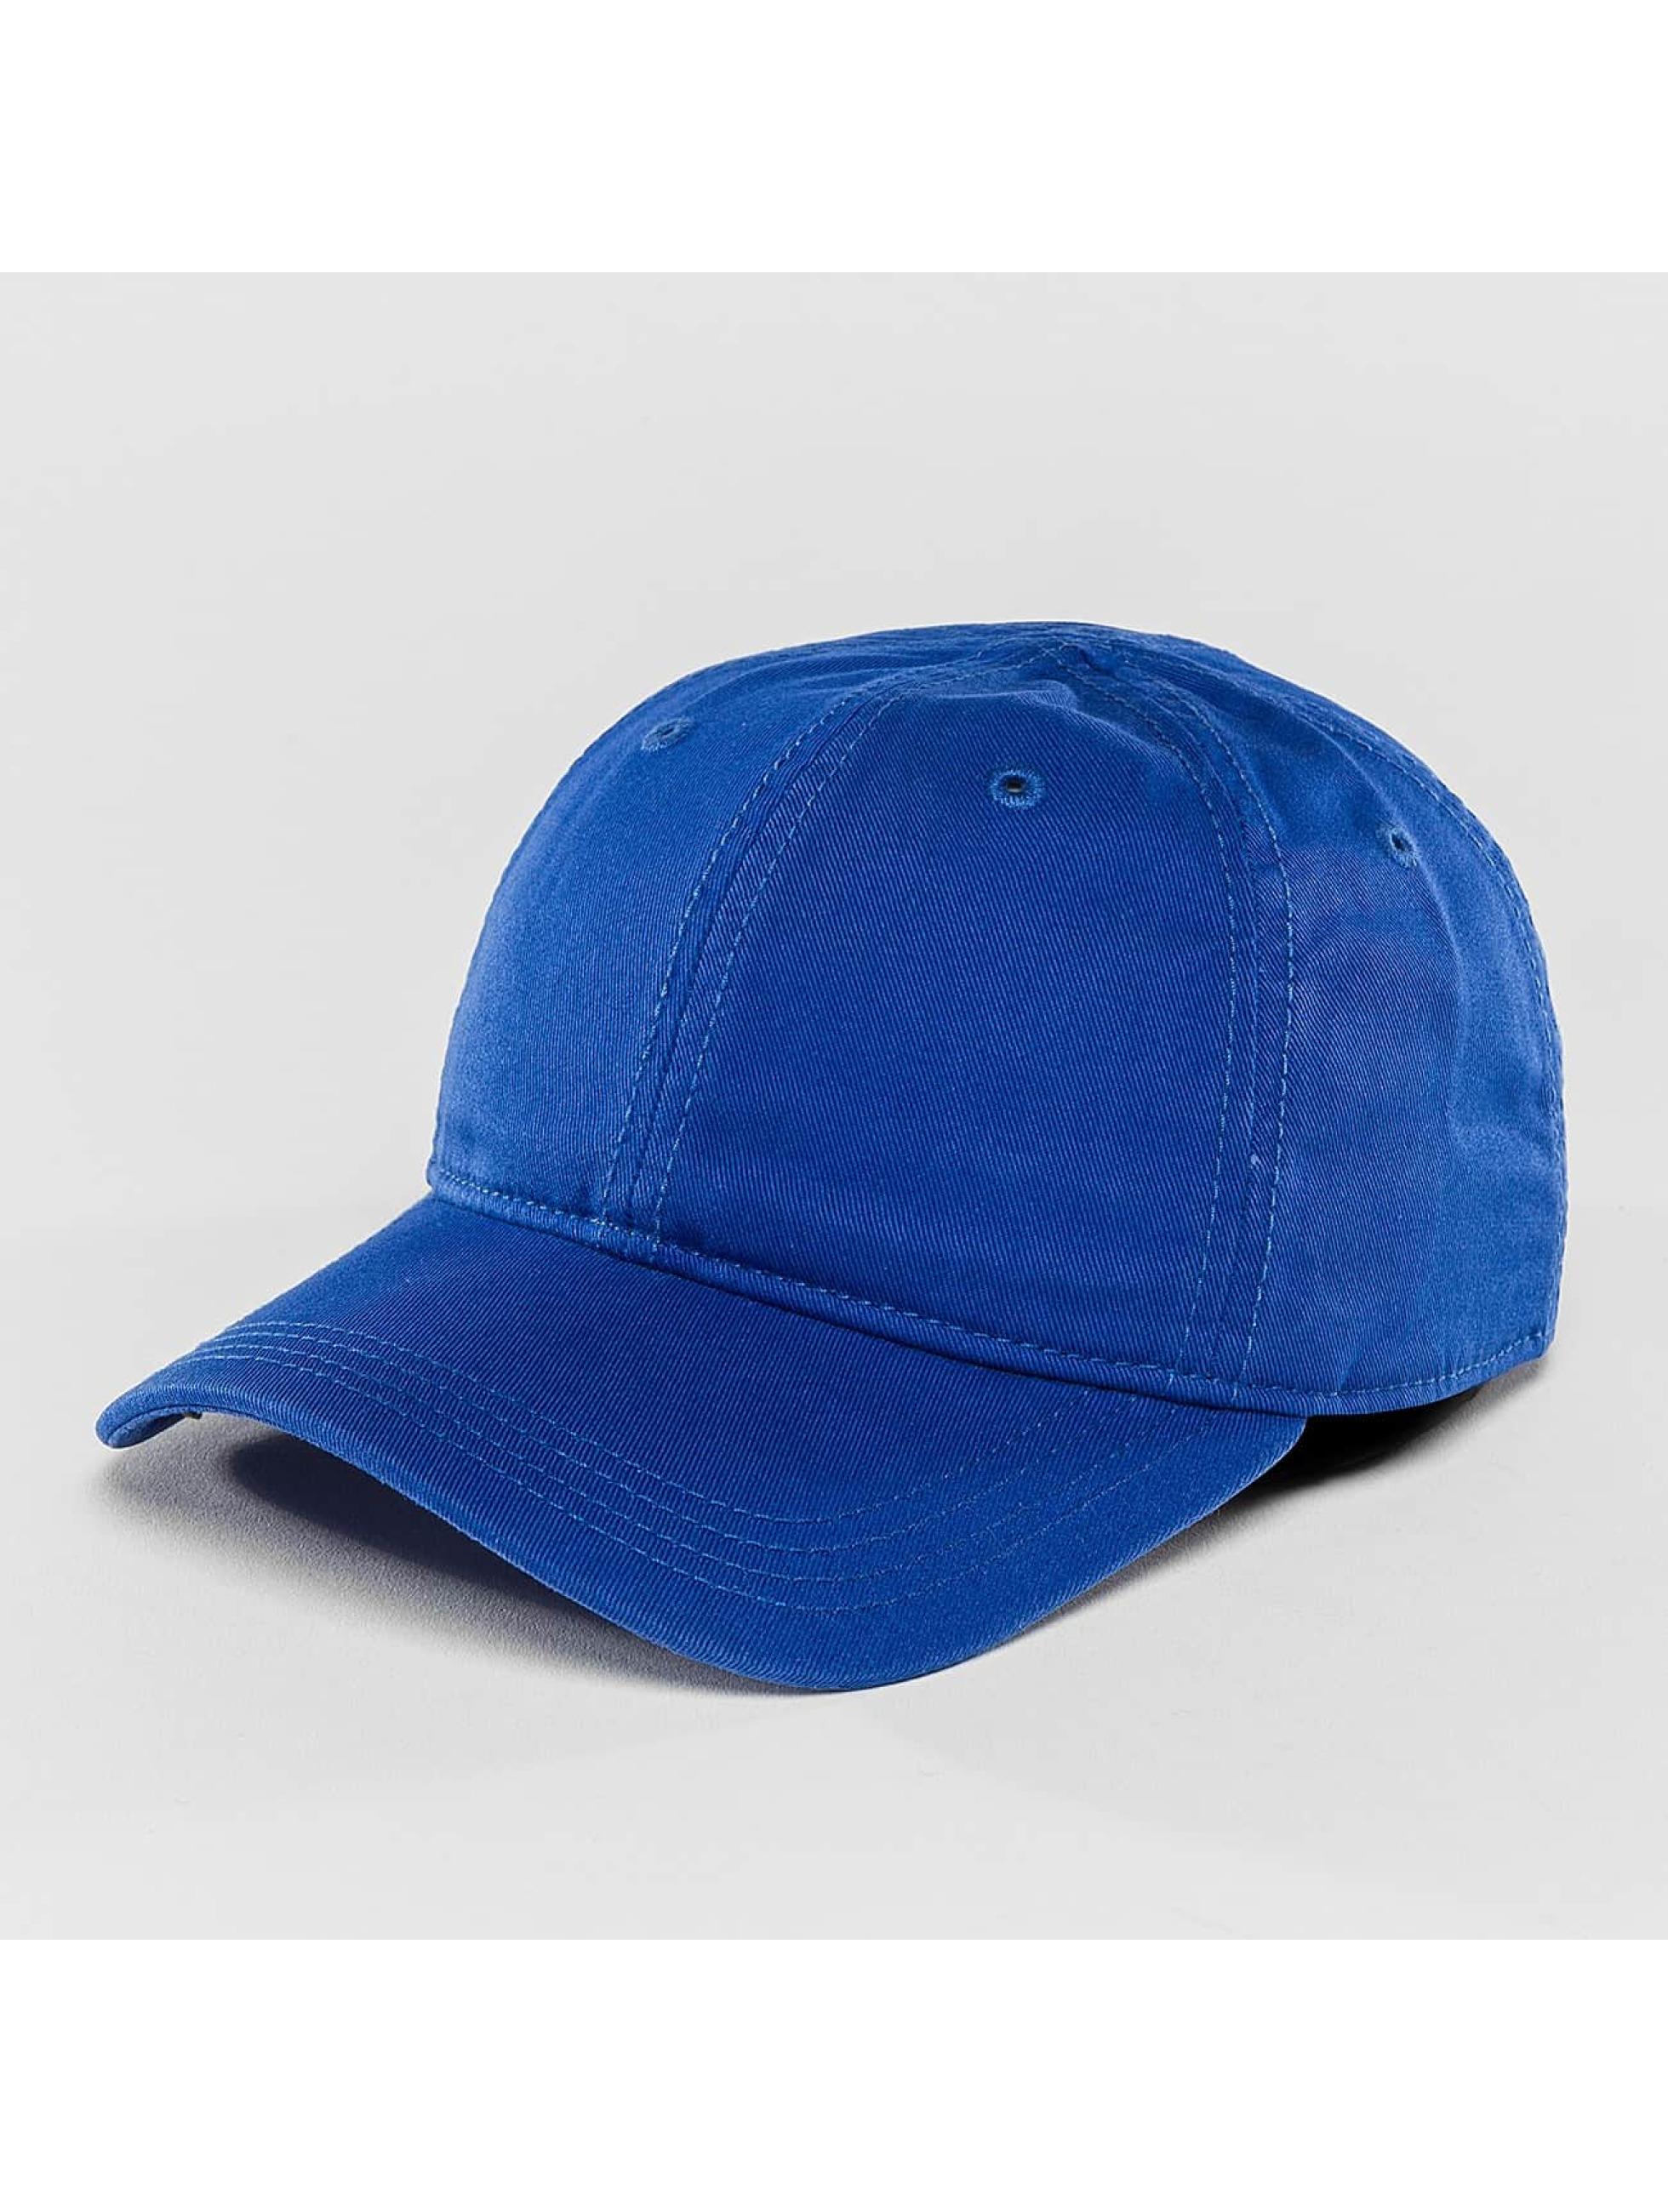 Lacoste Classic Snapback Cap Gabardine Croc blue